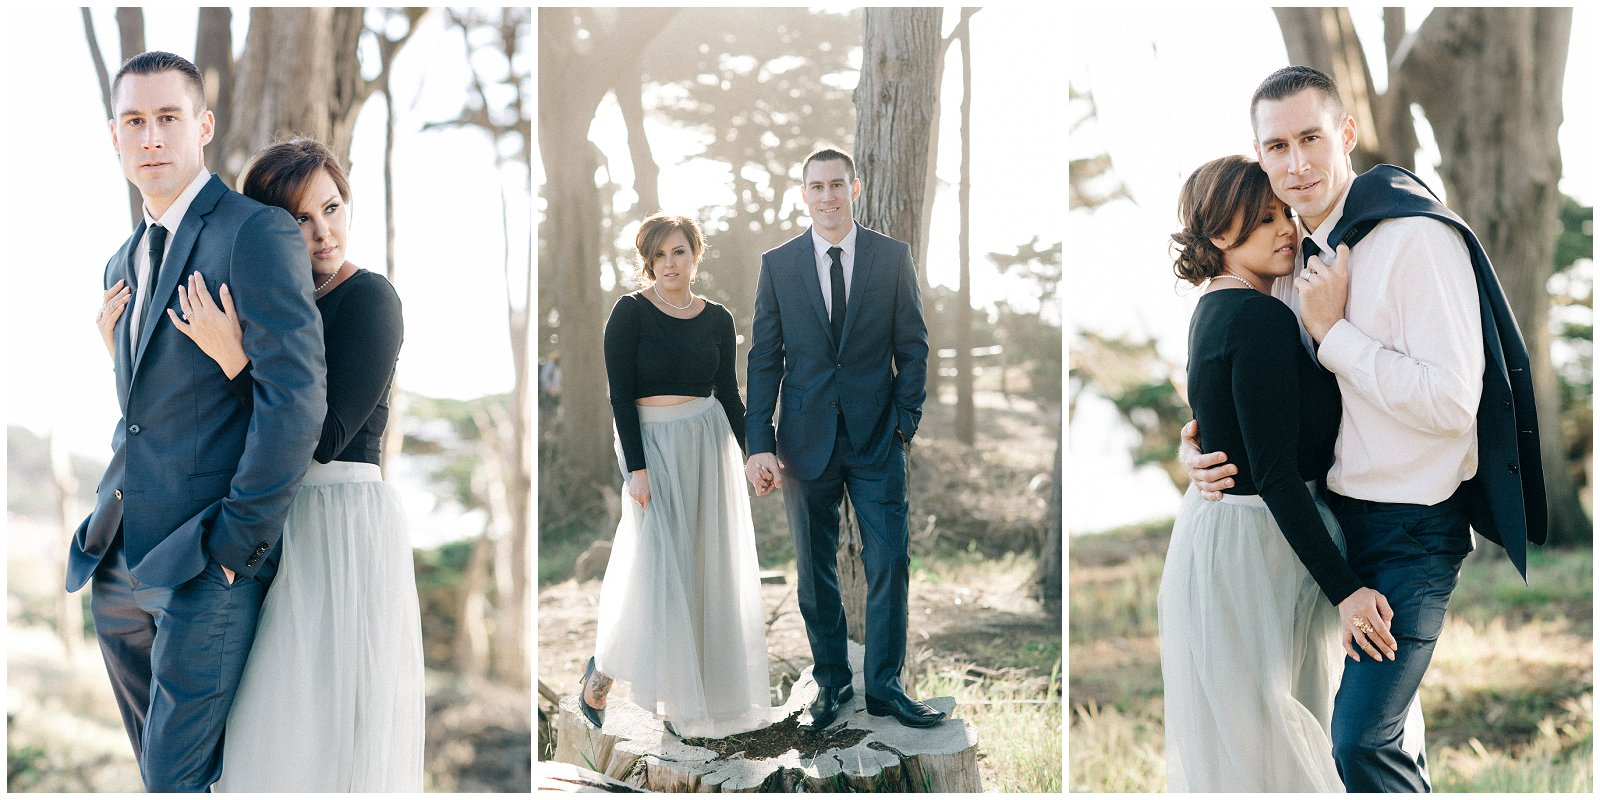 San-Francisco-Bay-Area-Wedding-Photography-Engagment-Session-10.jpg